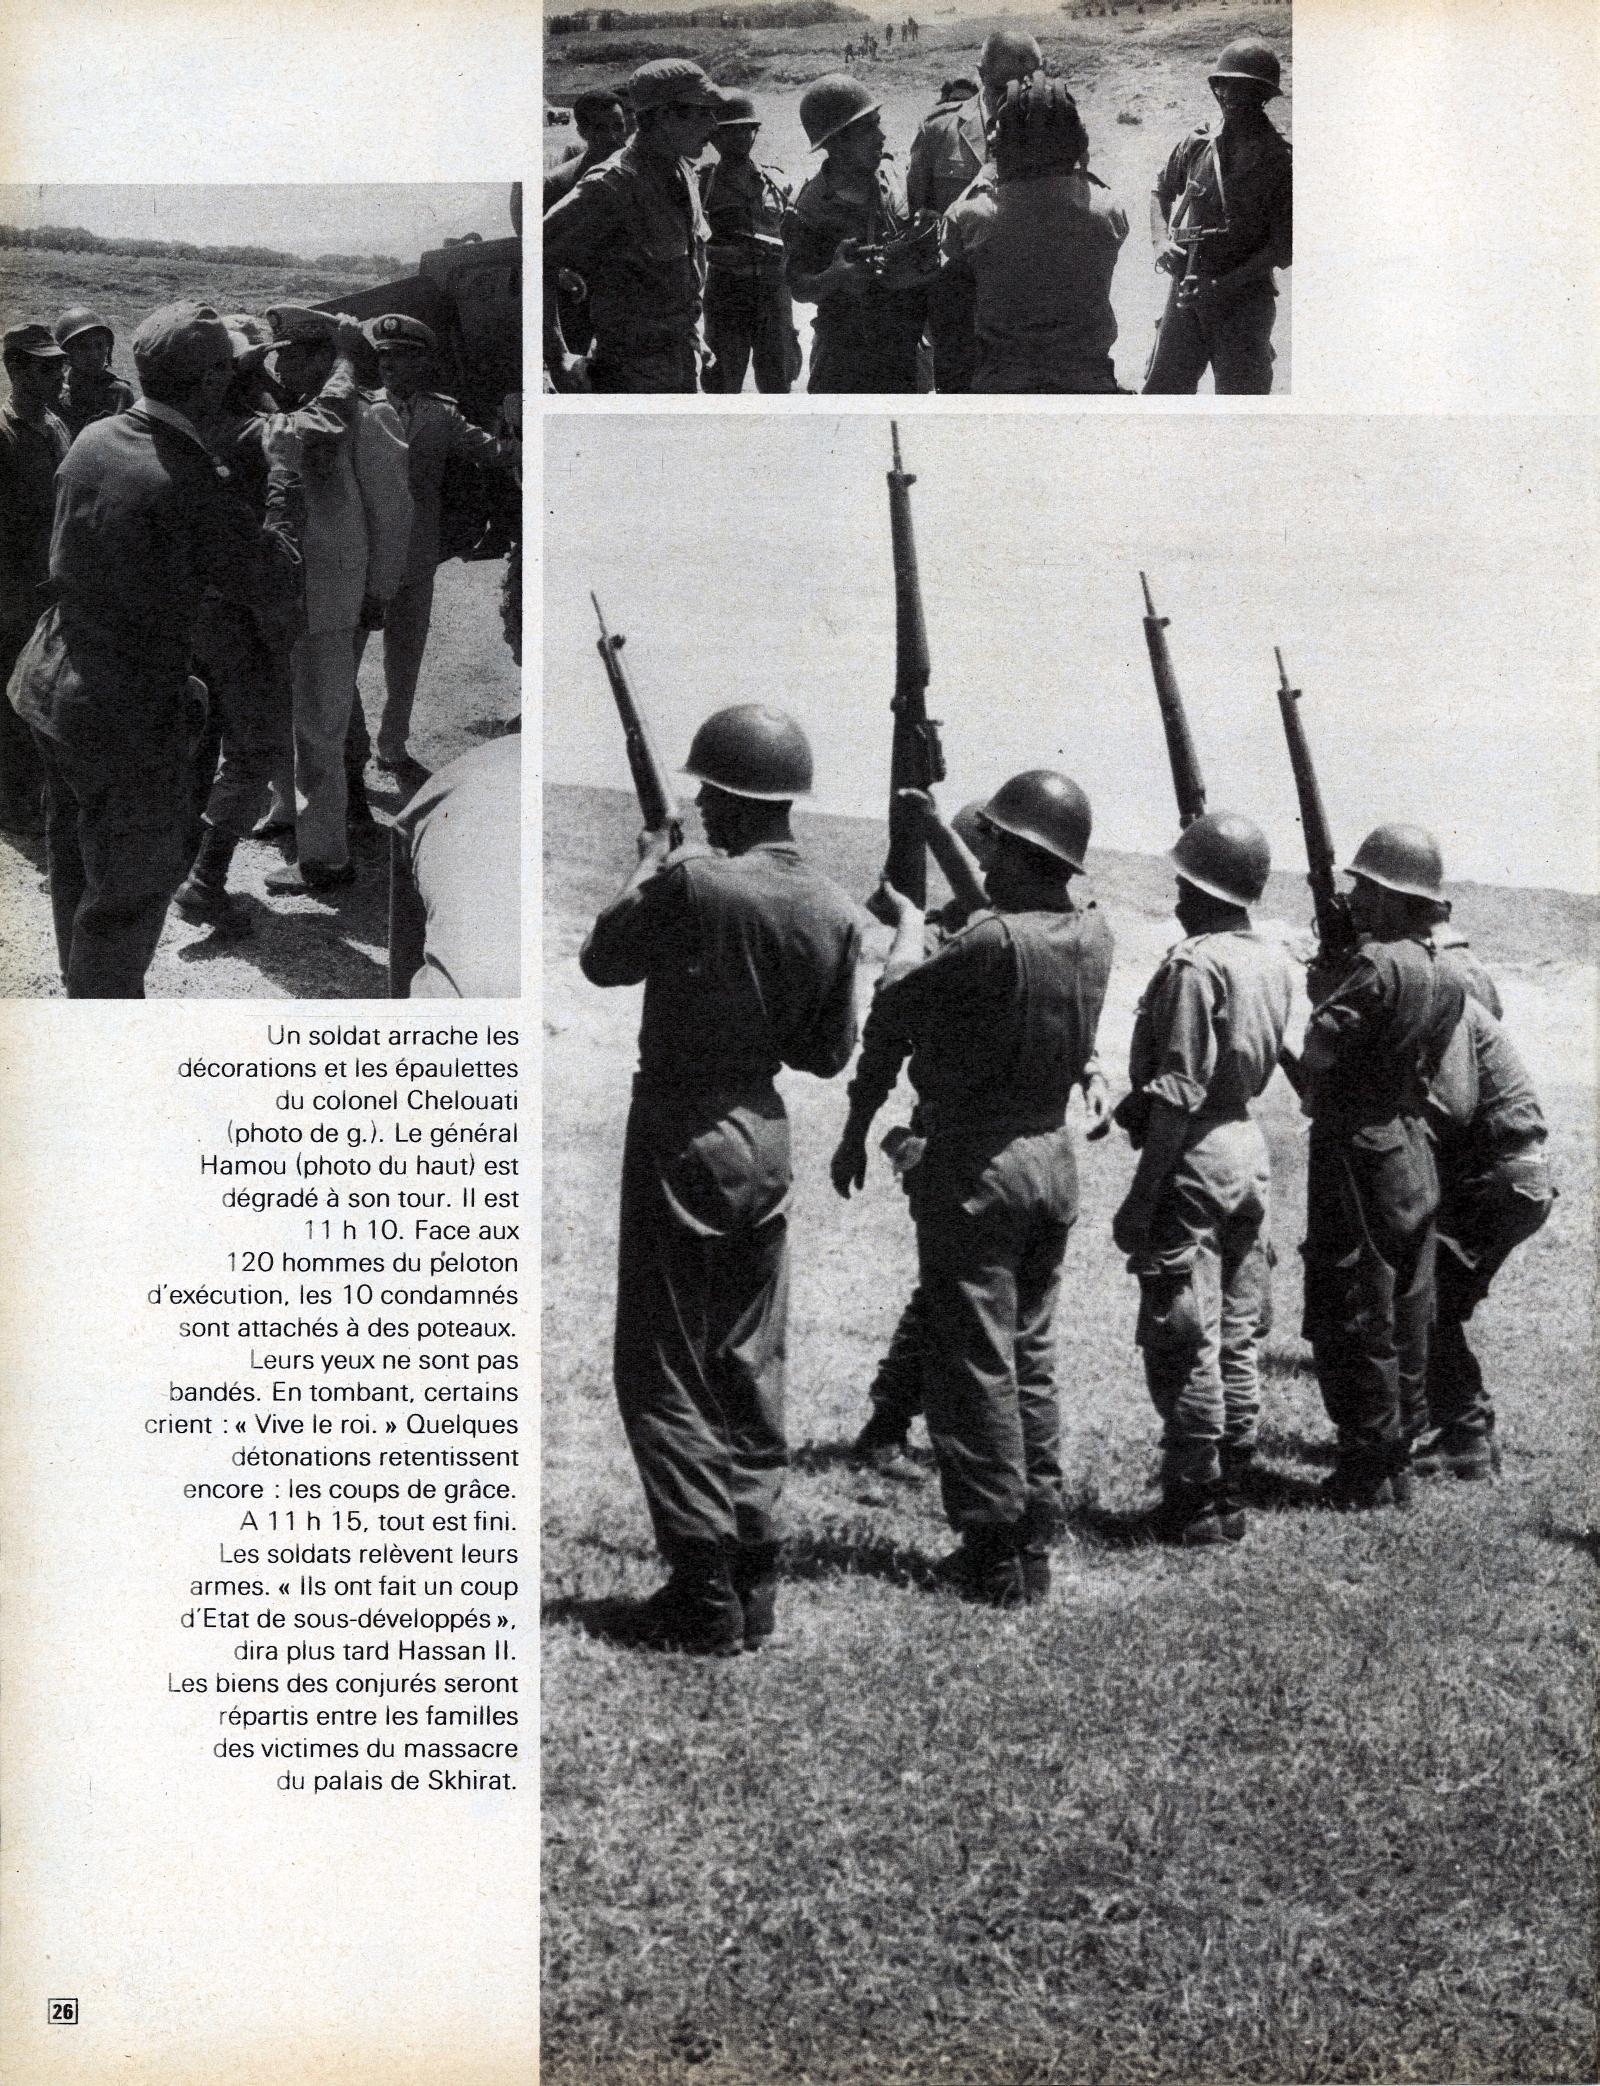 Tentative de coup d'État à Rabat et Skhirate le 10 juillet 1971  48695305733_735106ac5f_o